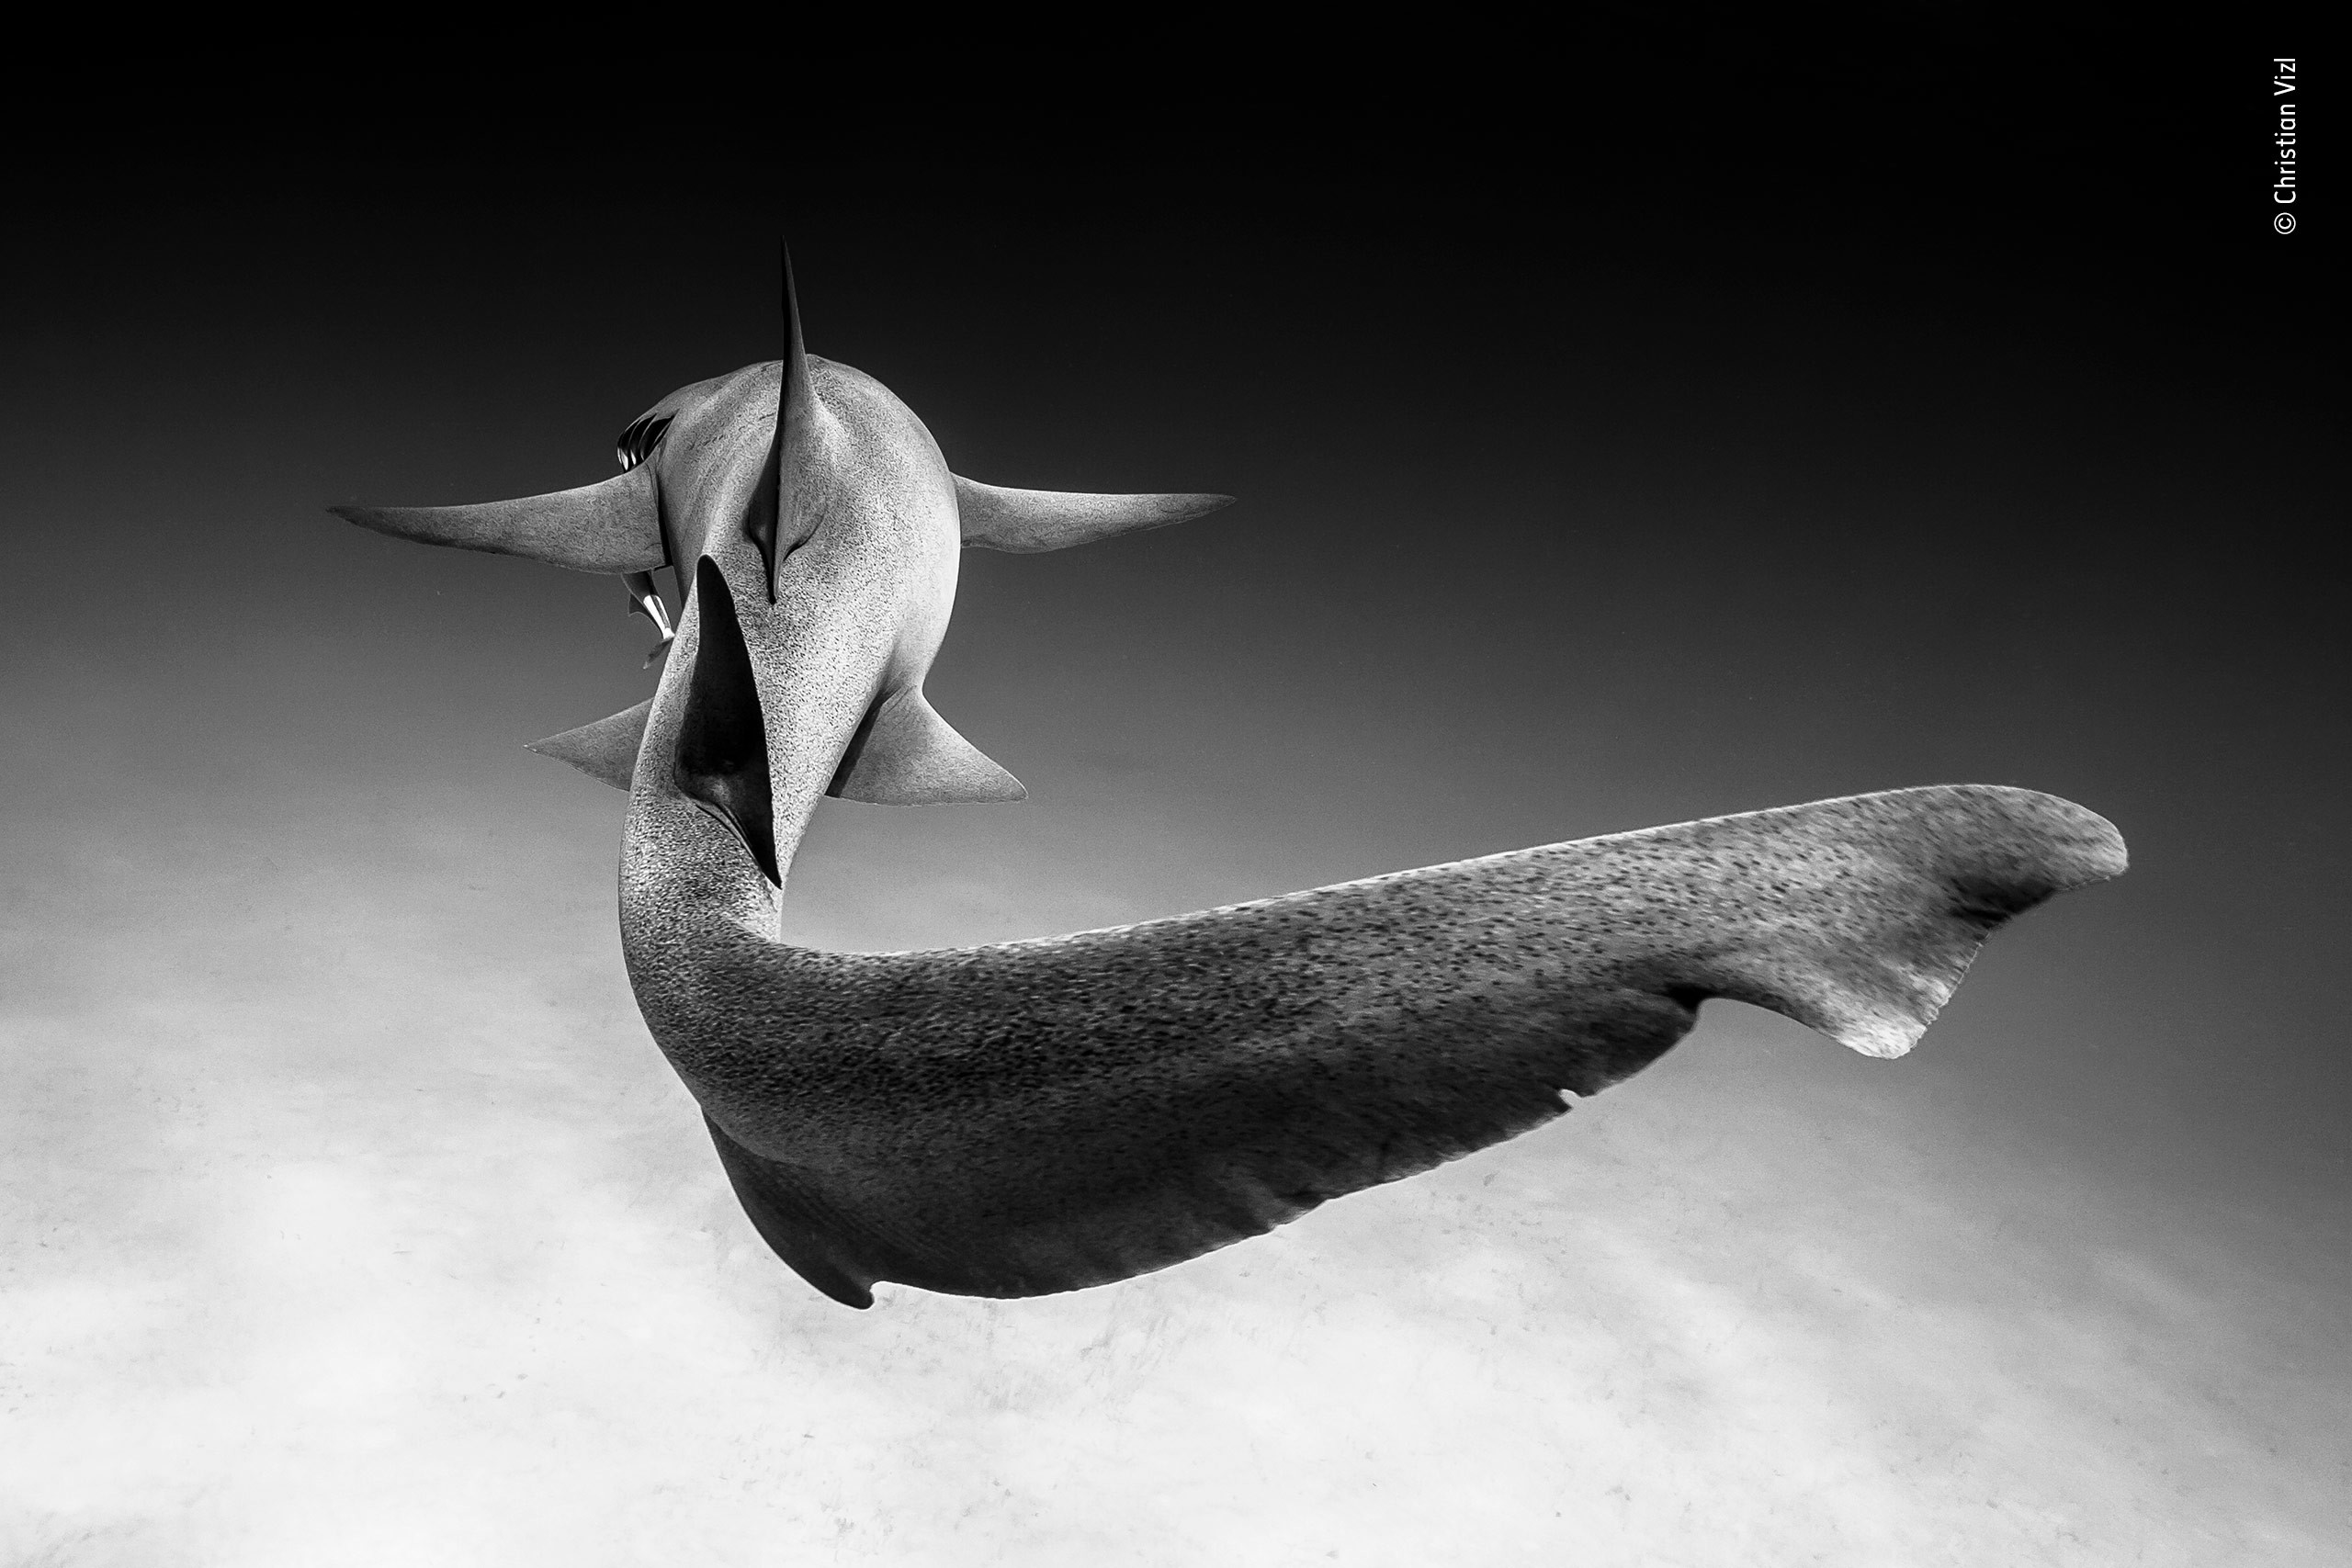 Фото: © Wildlife Photographer of the Year/Natural History Museum/Christian Vizl